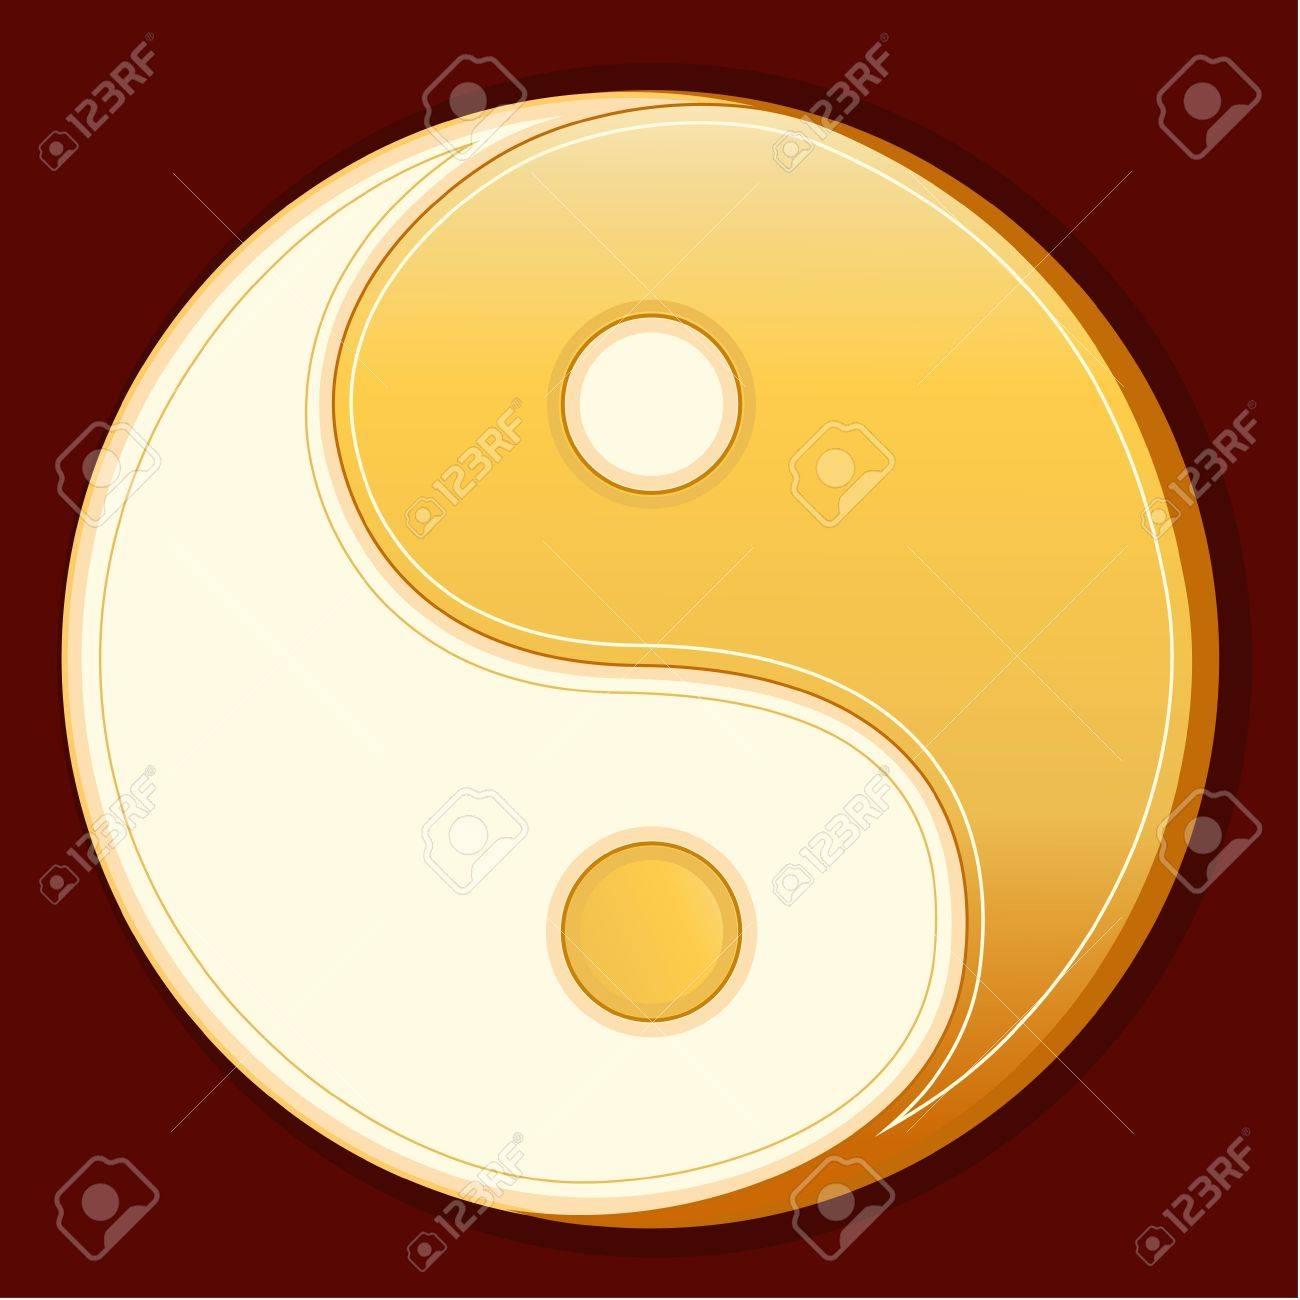 The tao symbol image collections symbol and sign ideas tao symbol gold yin yang mandala crimson red background royalty tao symbol gold yin yang mandala buycottarizona